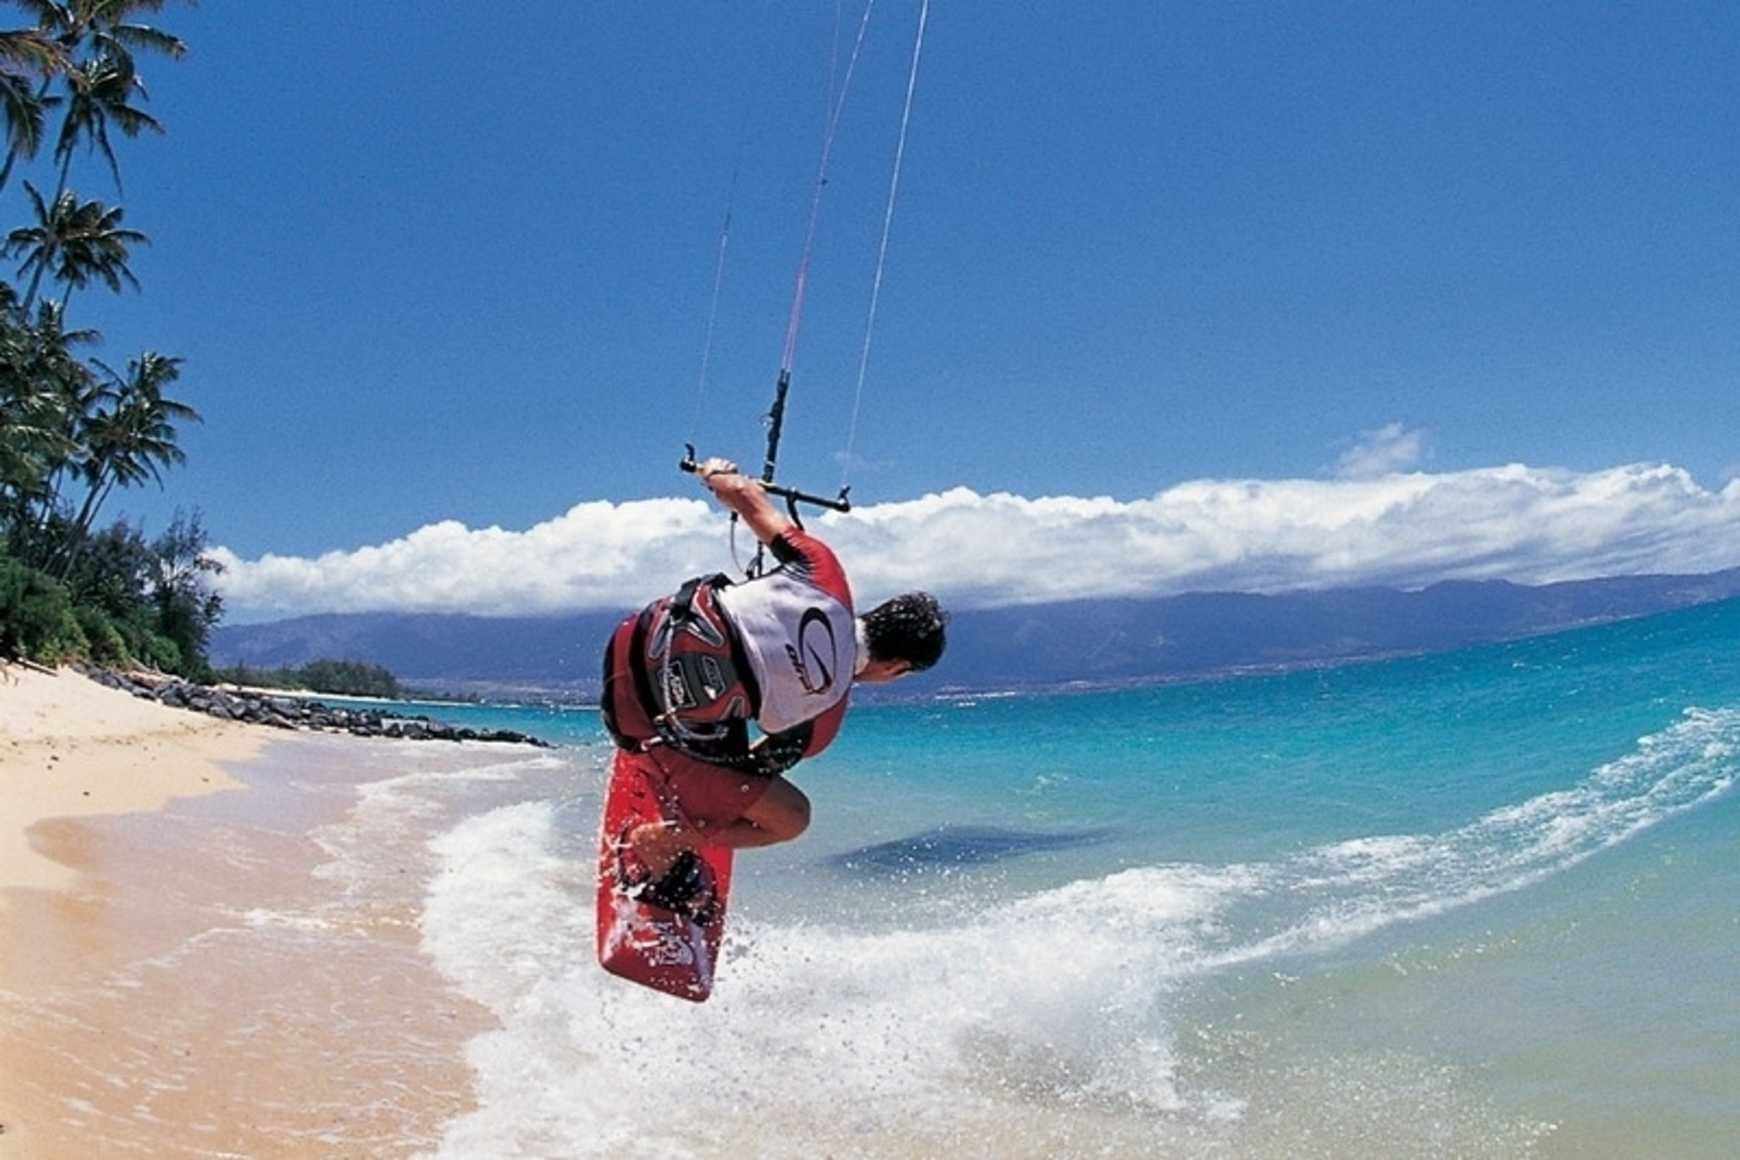 Basics of Kite Surfing - 2 Hours Lesson around Sanur